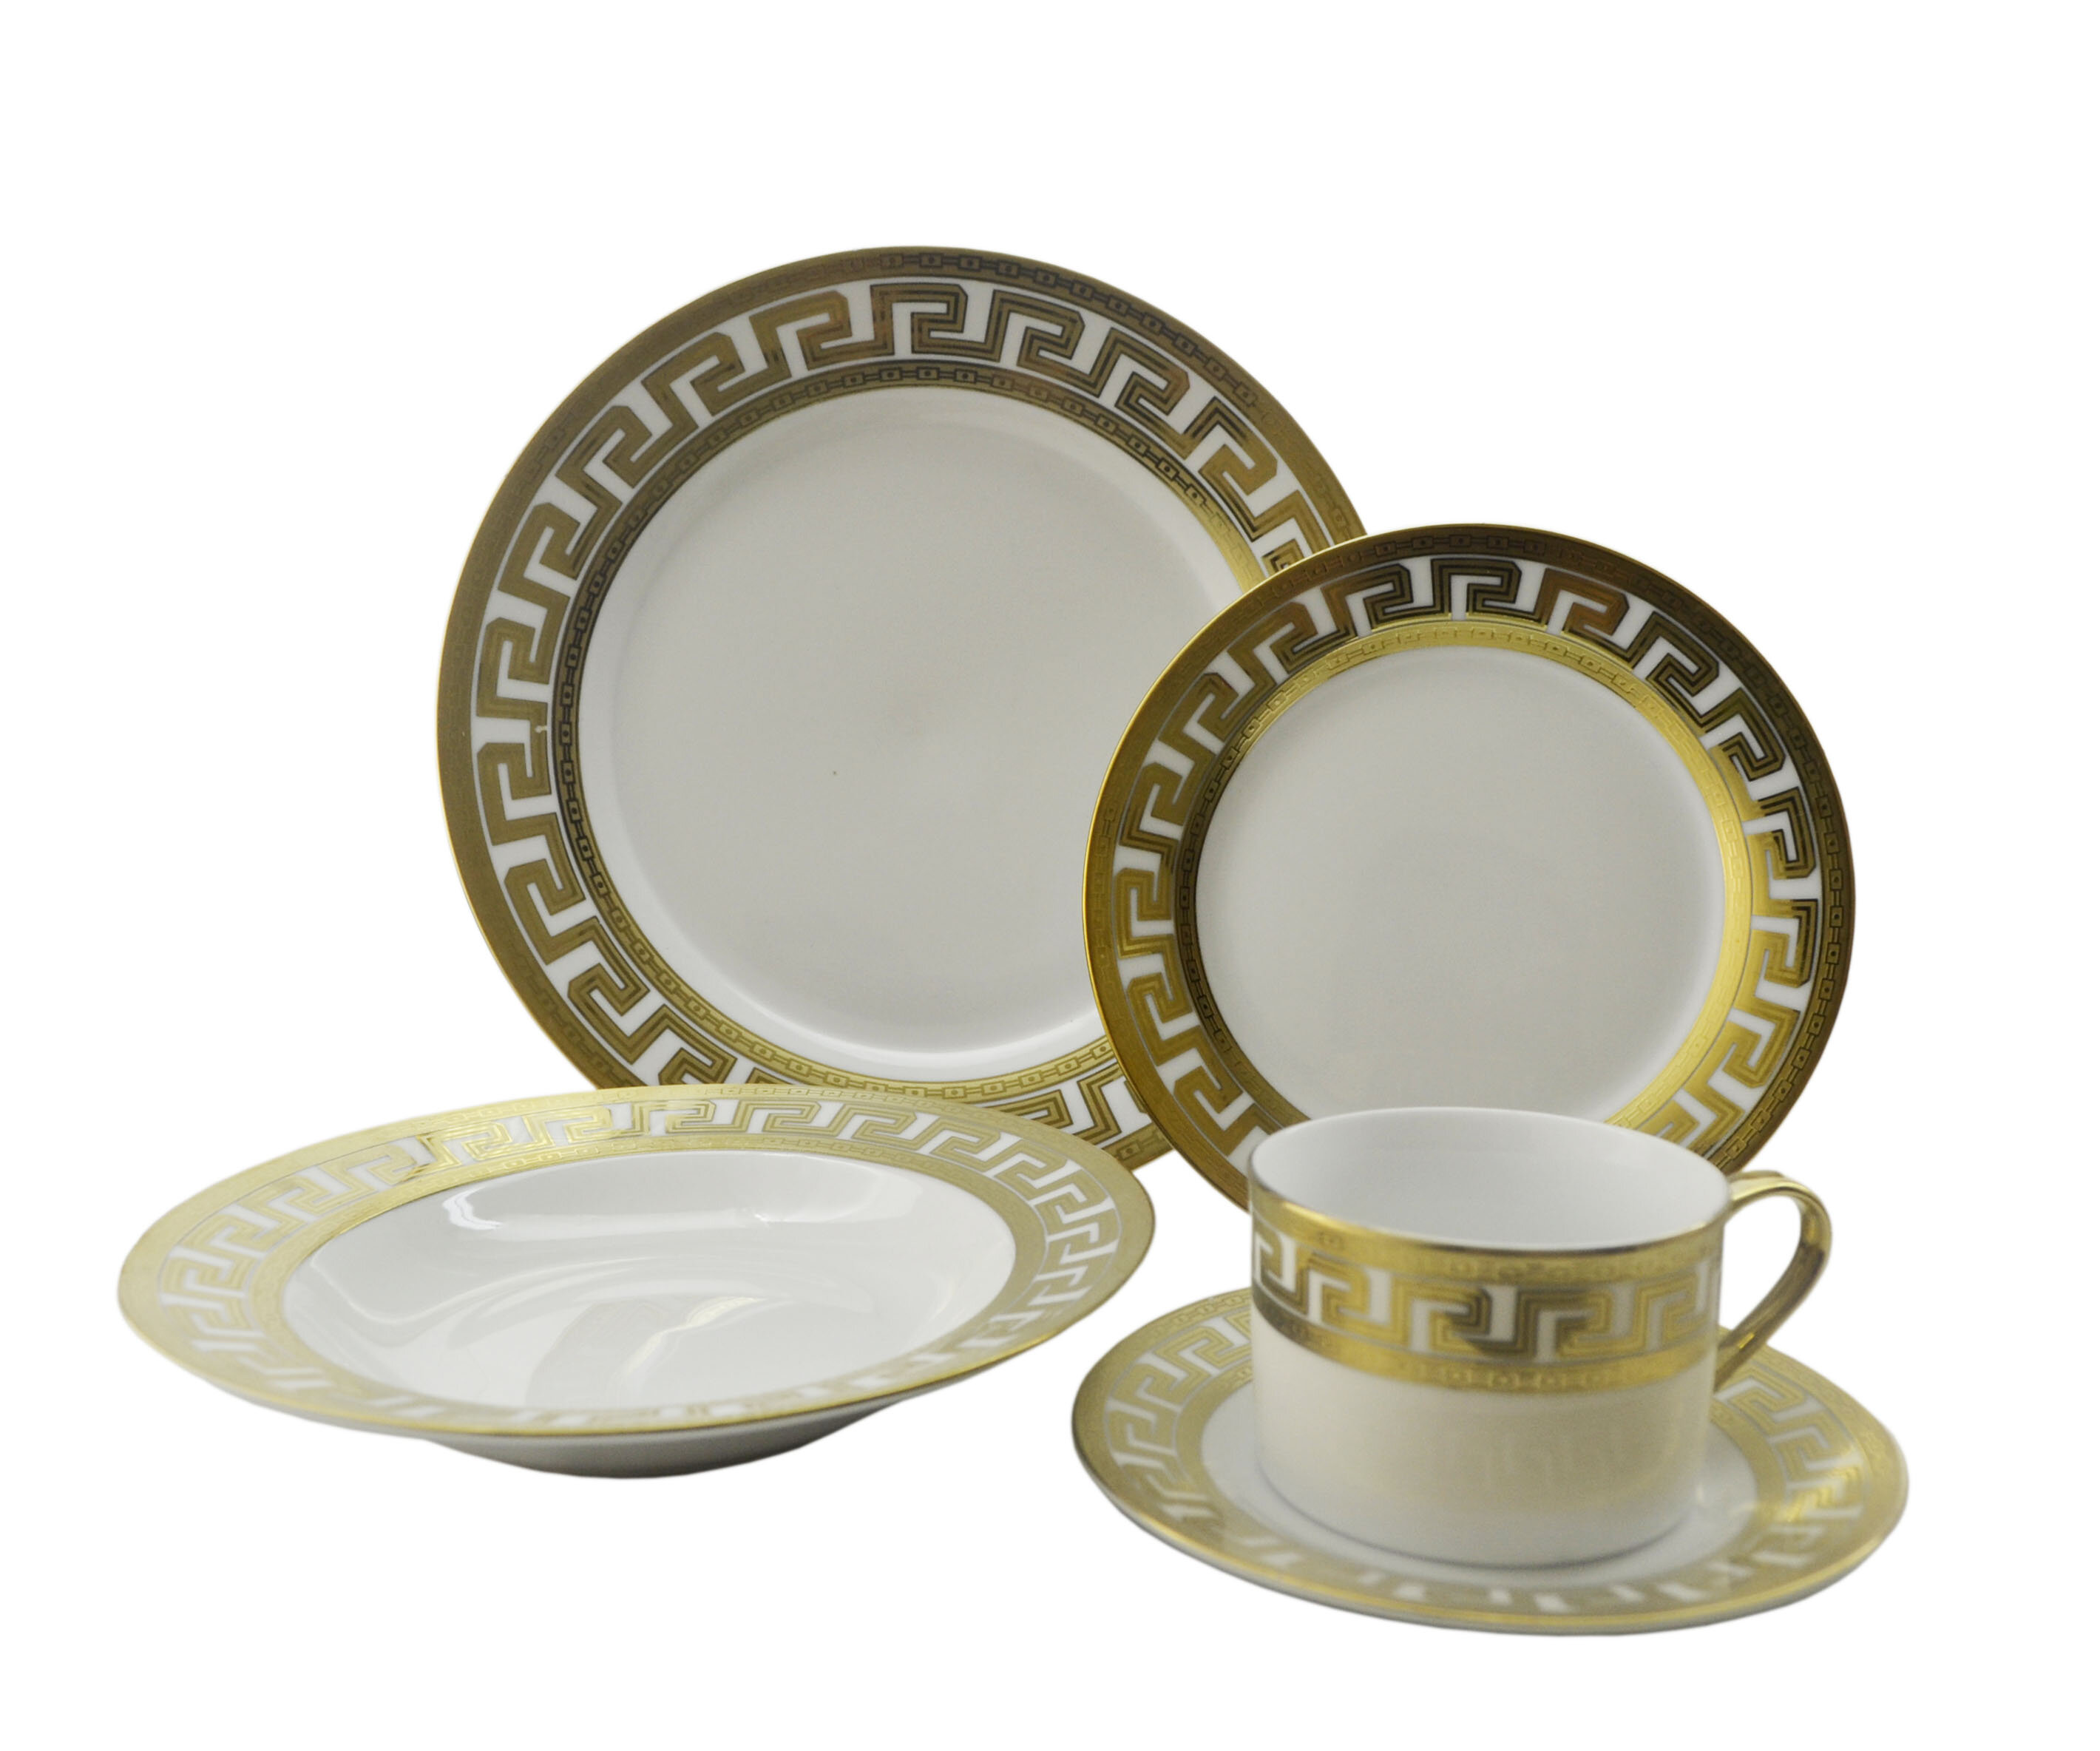 Three Star Inspired Versace 40 Piece Dinnerware Set Service for 8 u0026 Reviews   Wayfair  sc 1 st  Wayfair & Three Star Inspired Versace 40 Piece Dinnerware Set Service for 8 ...